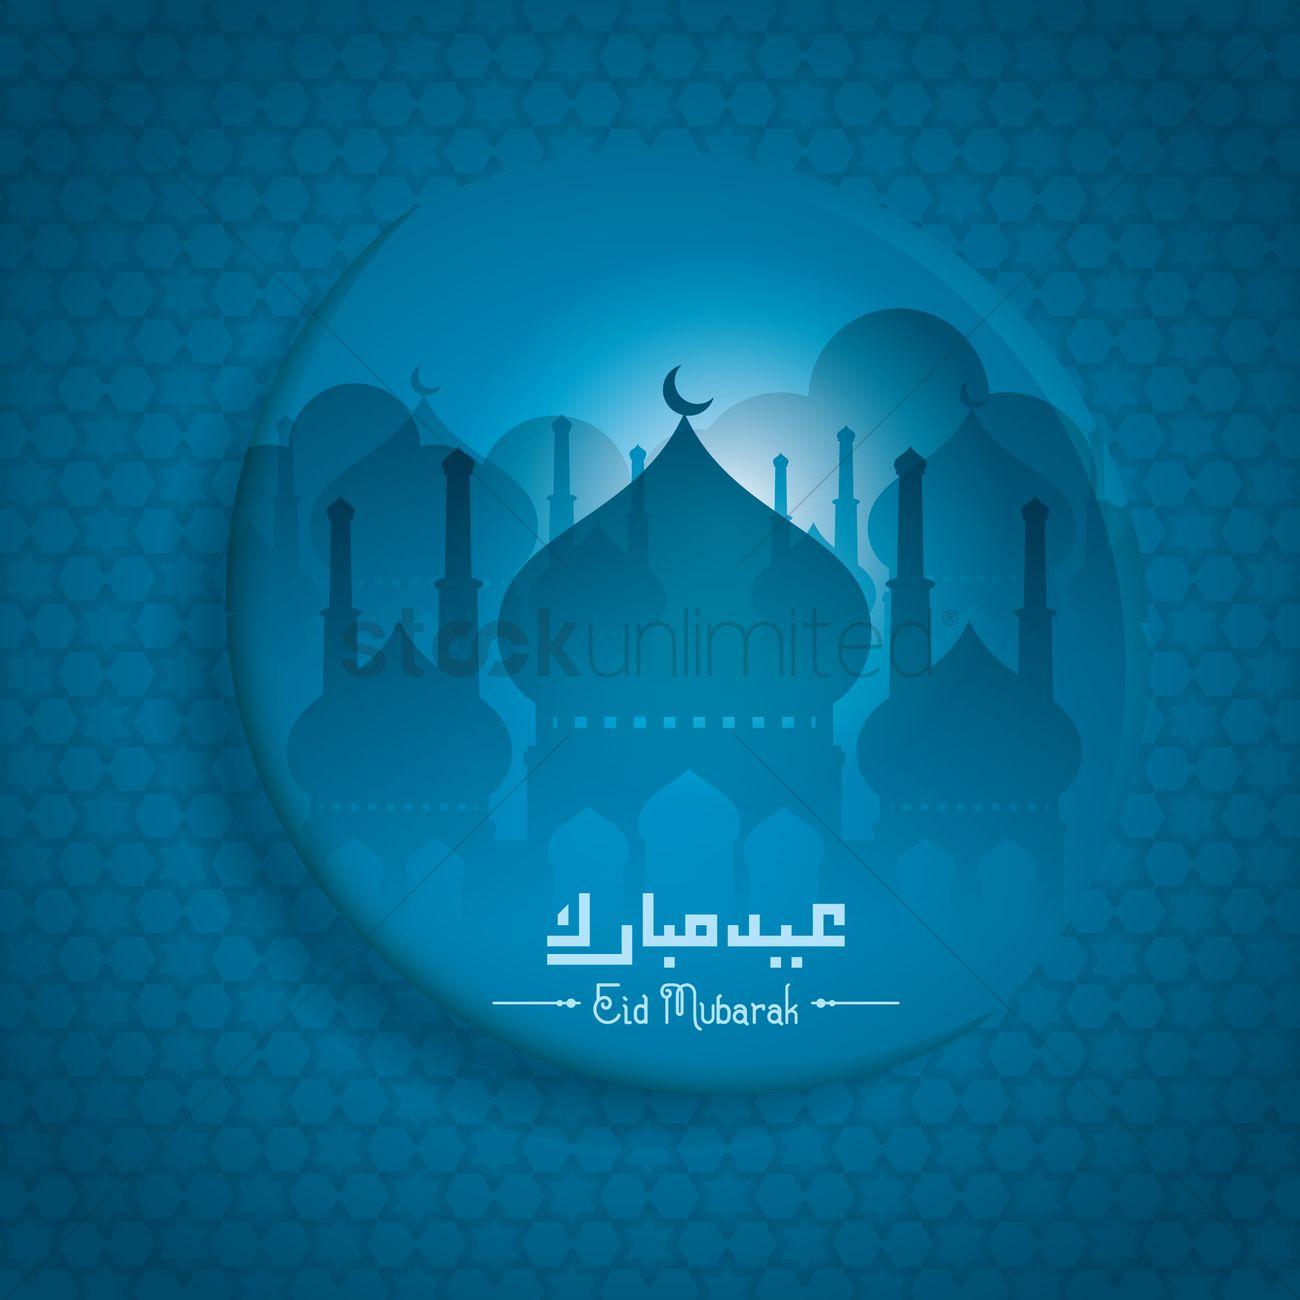 Eid mubarak greeting in jawi vector image 1826858 stockunlimited eid mubarak greeting in jawi vector graphic kristyandbryce Choice Image